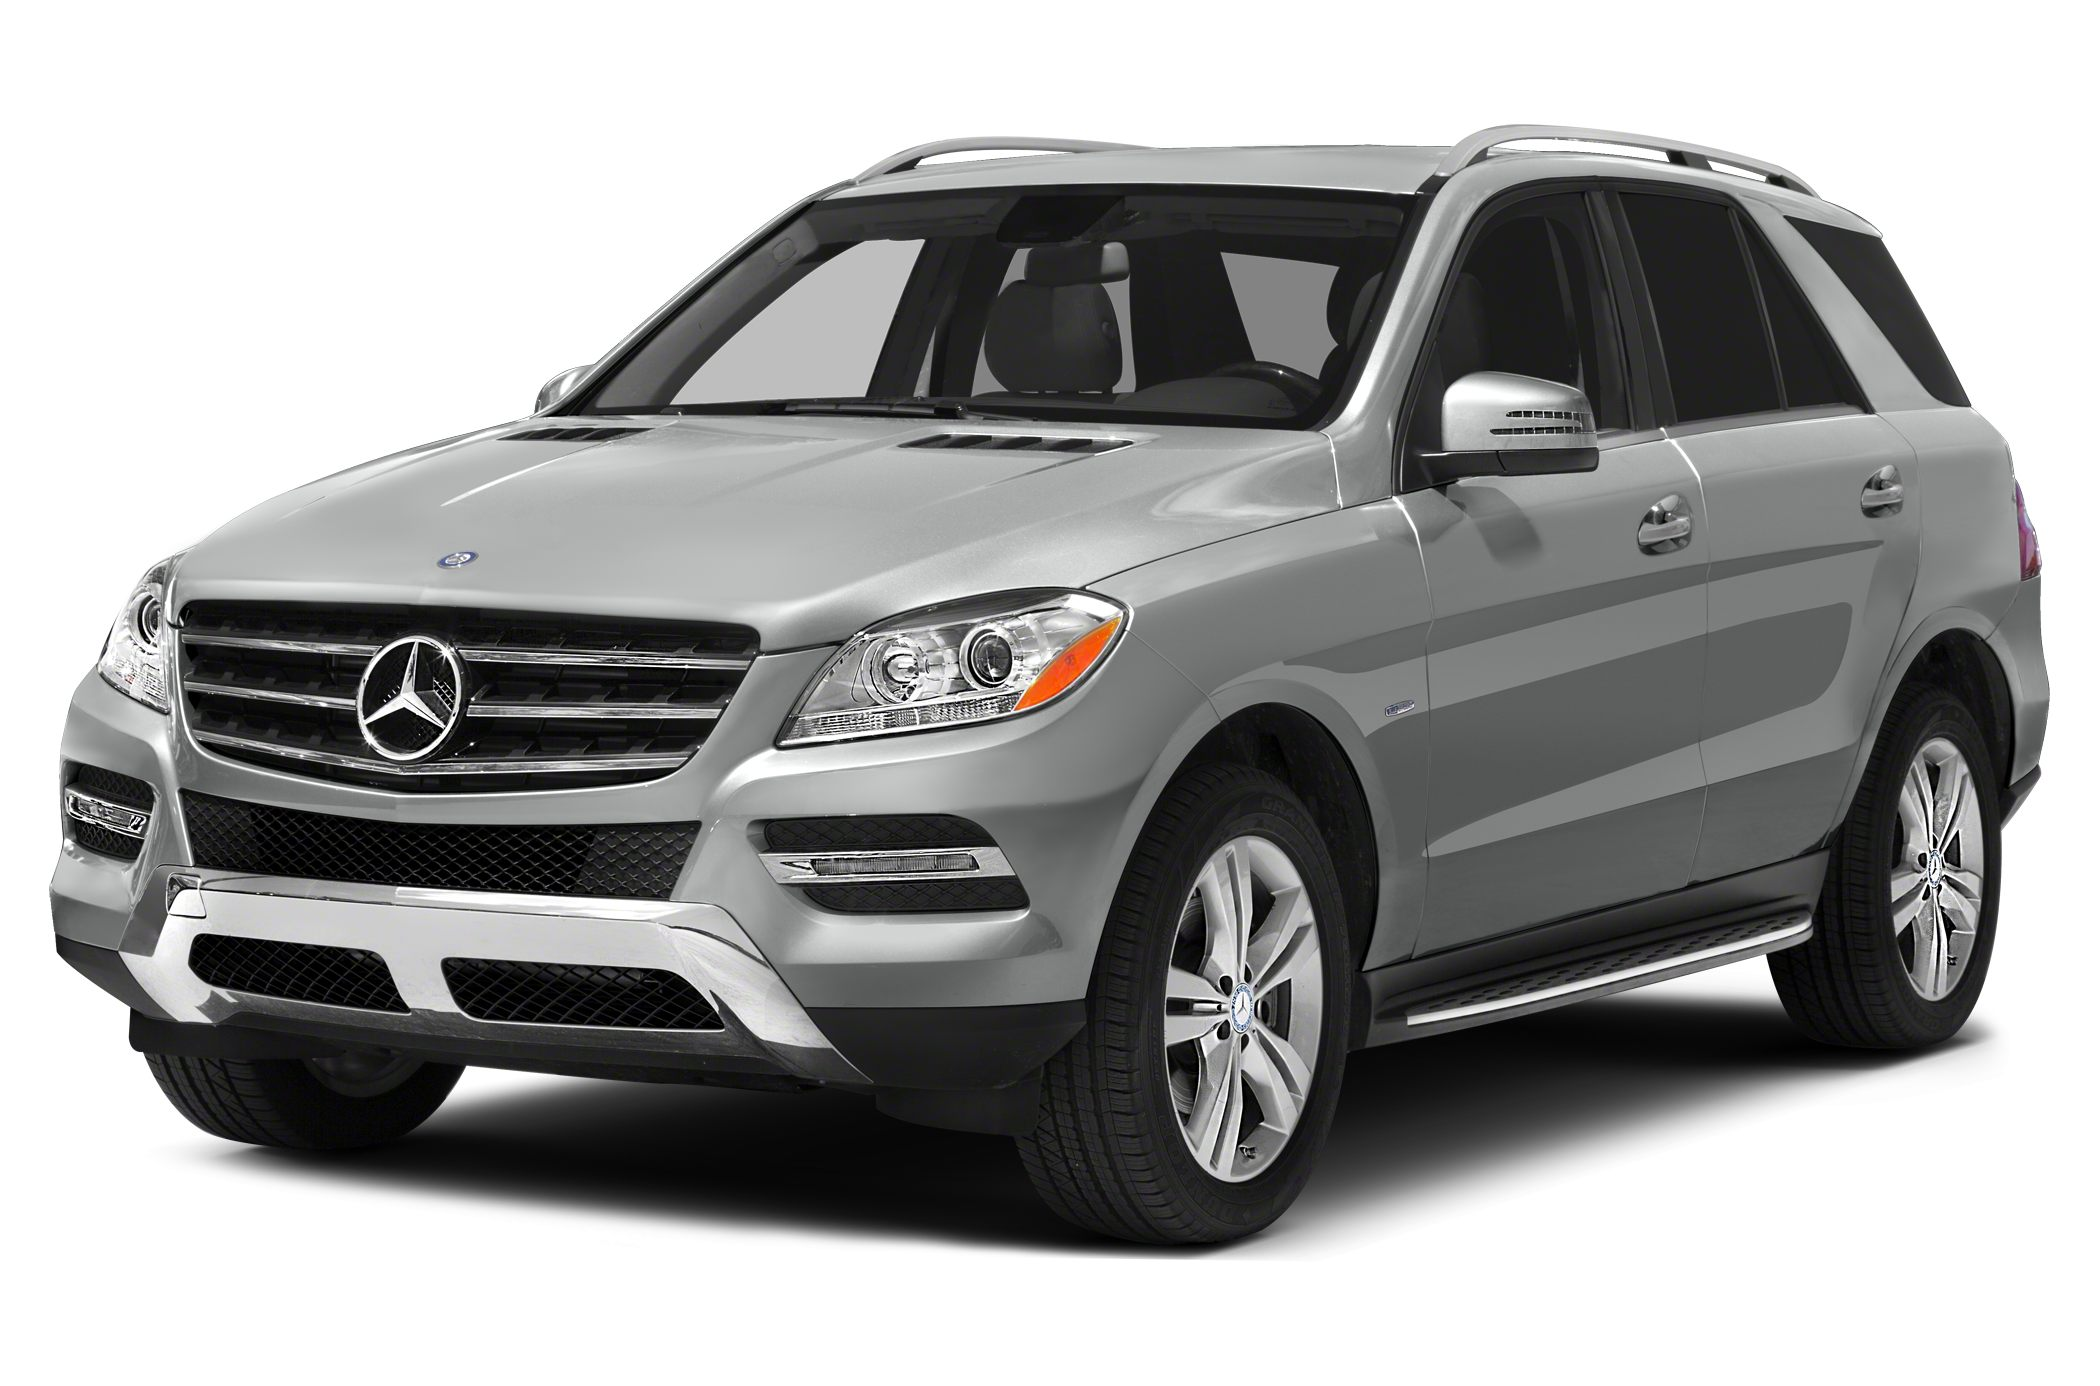 2012 Mercedes Benz M Class Base Ml 350 Bluetec 4dr All Wheel Drive 1998 Ml320 Fuel Filter 4matic Review Autoblog